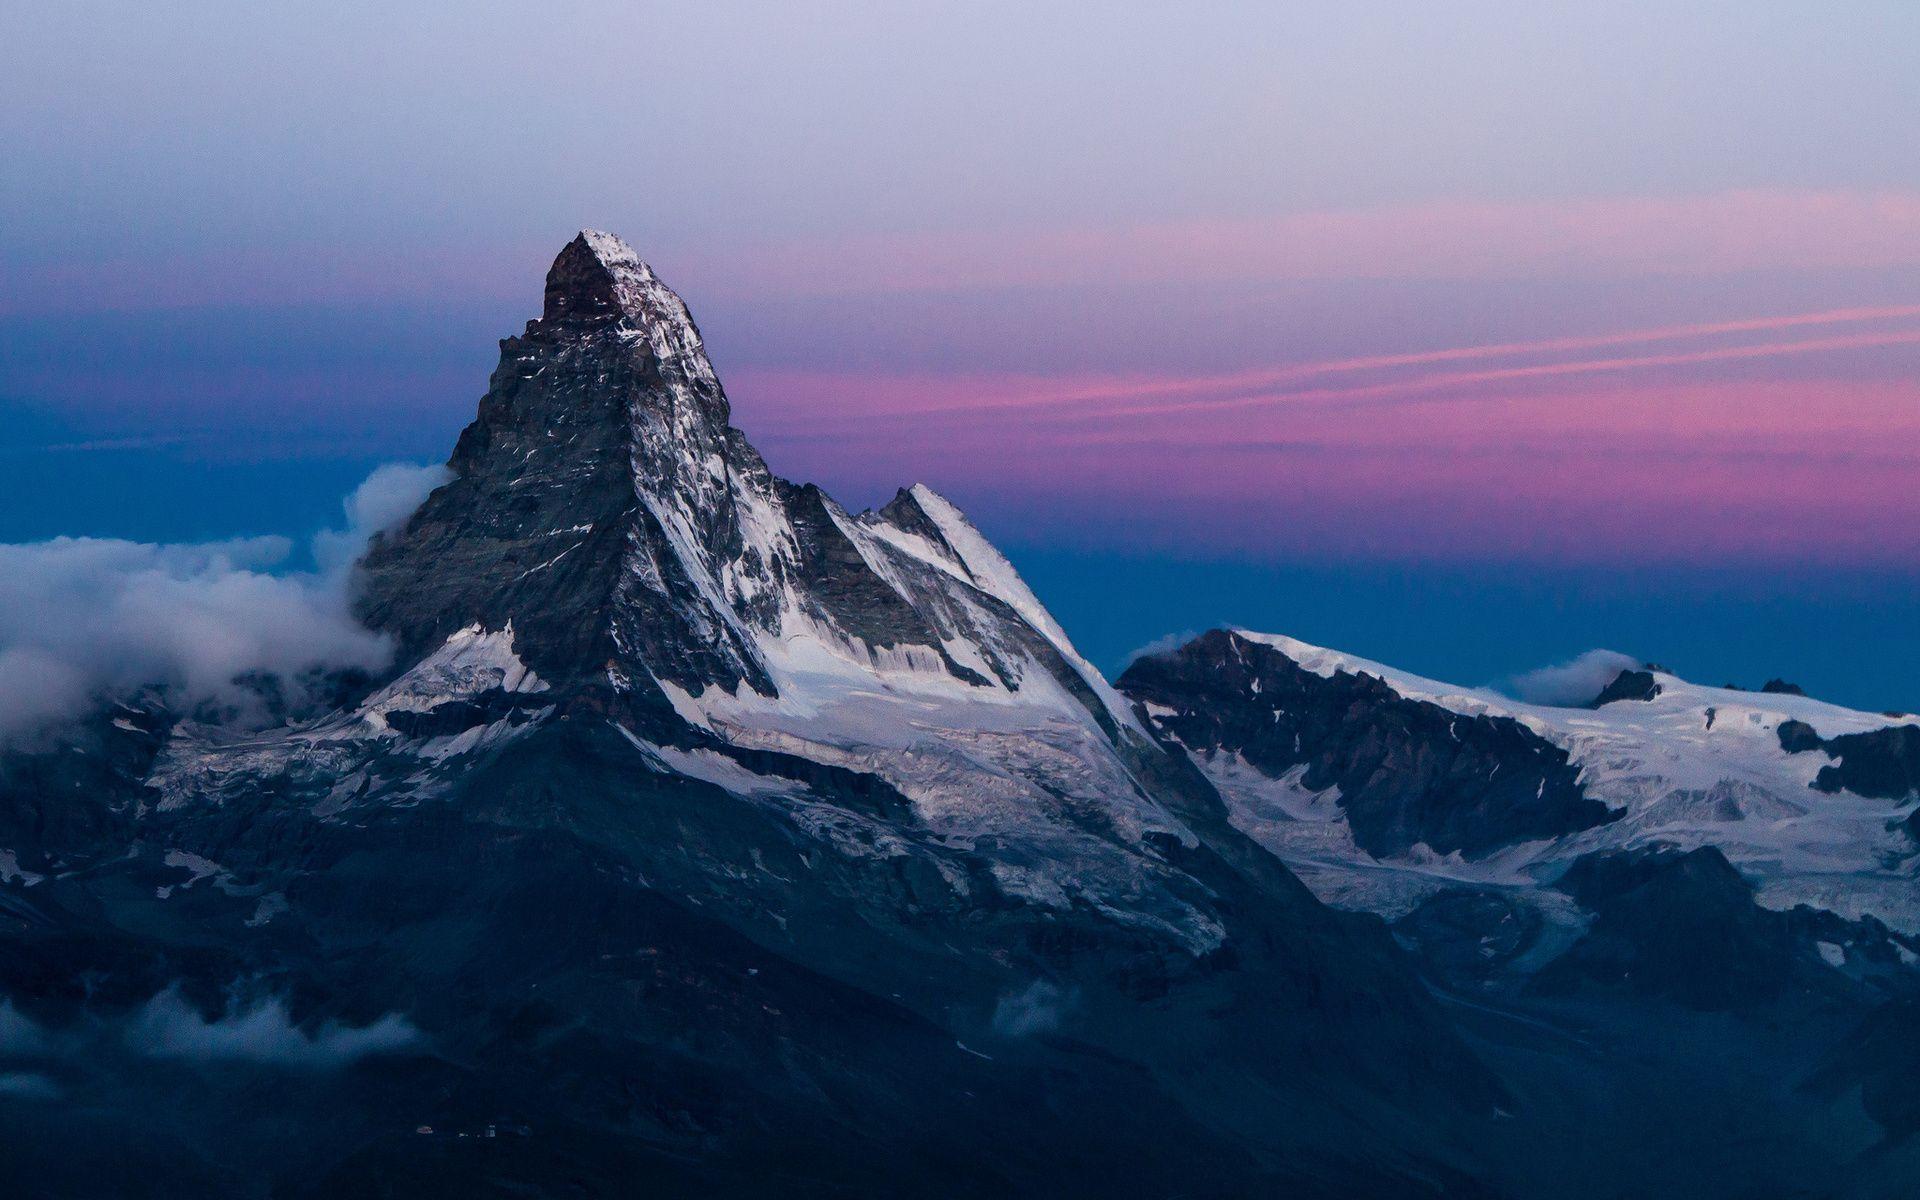 Top Wallpaper Mountain Google - 7d349f42382a04def64add167982407f  Image_287338.jpg